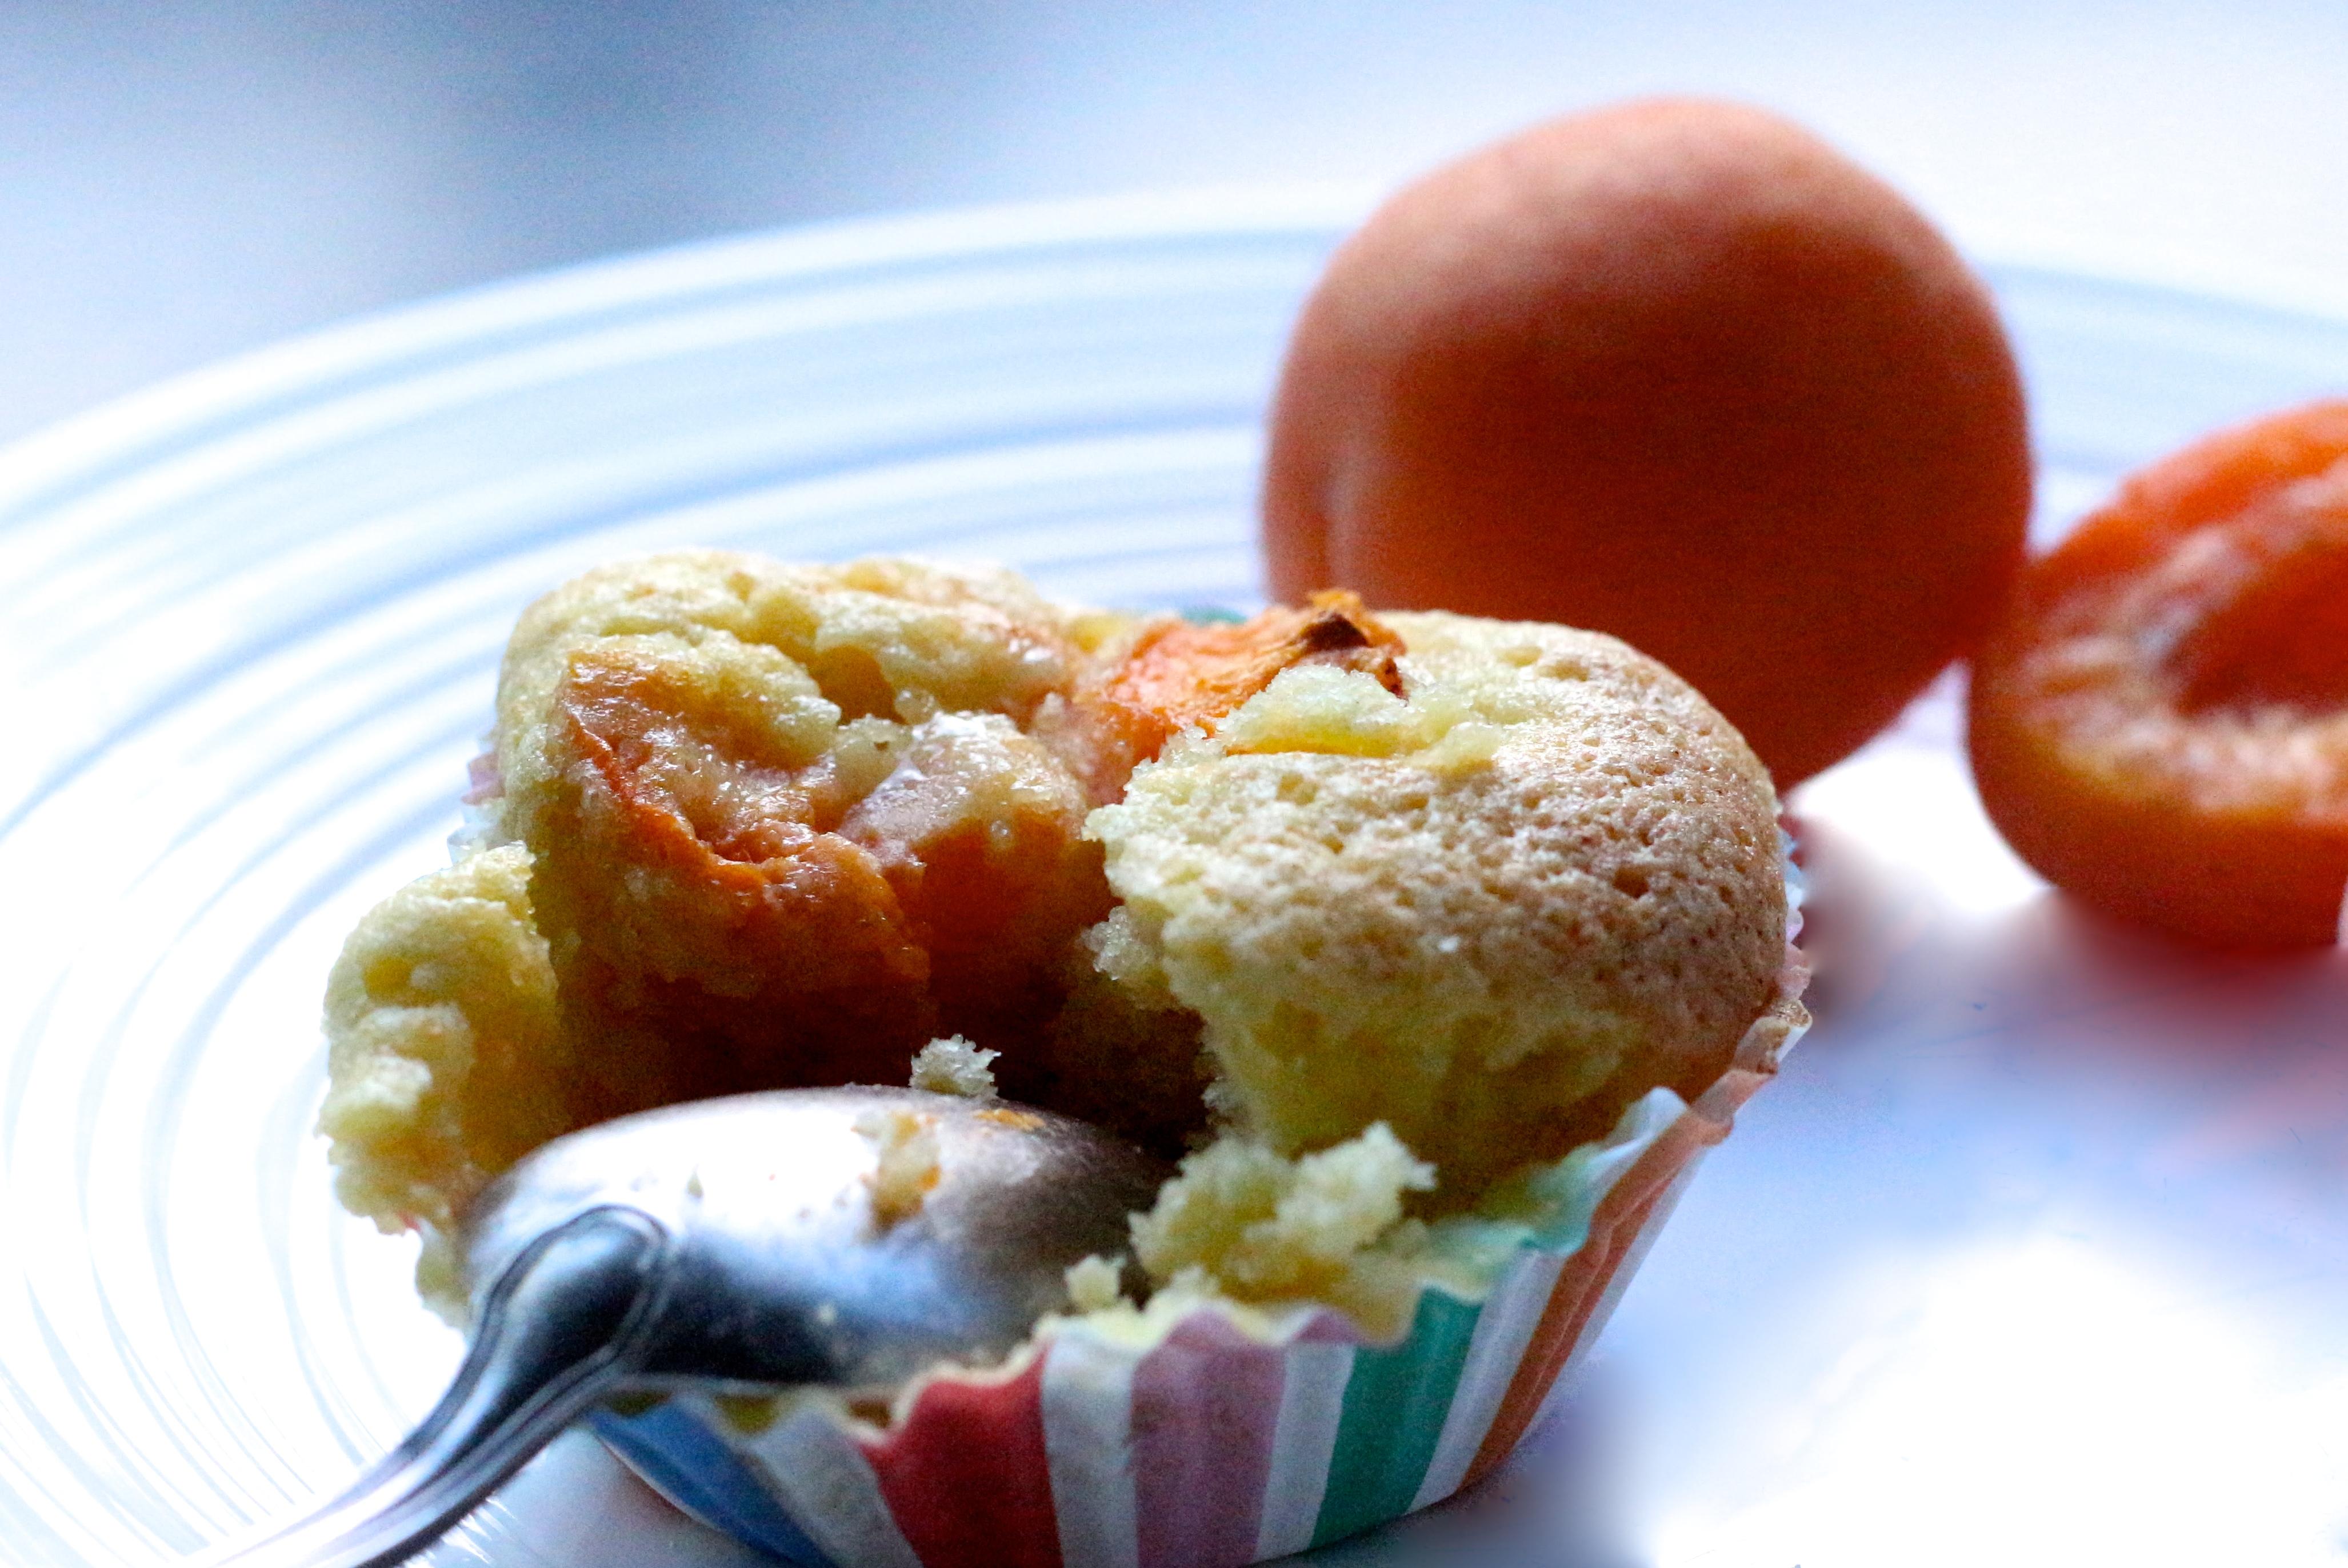 Muffins à l'abricot et à l'huile d'olive